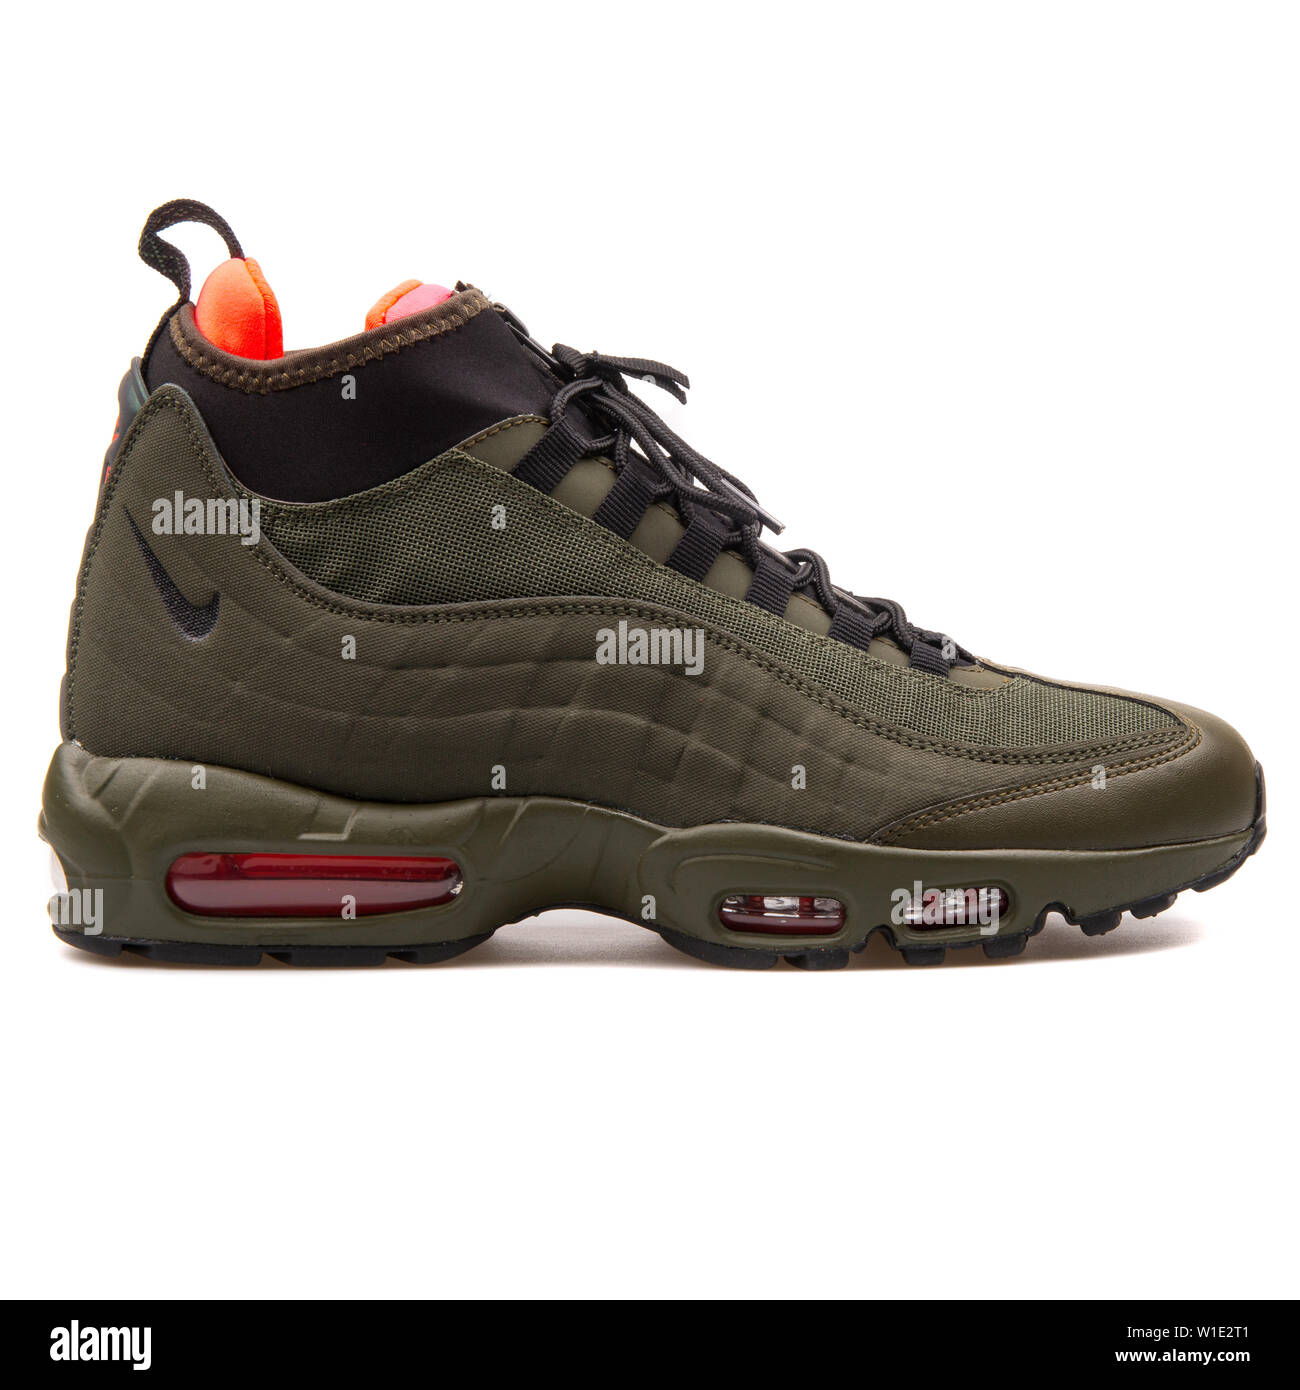 nouveau produit 6747a 8d815 VIENNA, AUSTRIA - AUGUST 25, 2017: Nike Air Max 95 ...